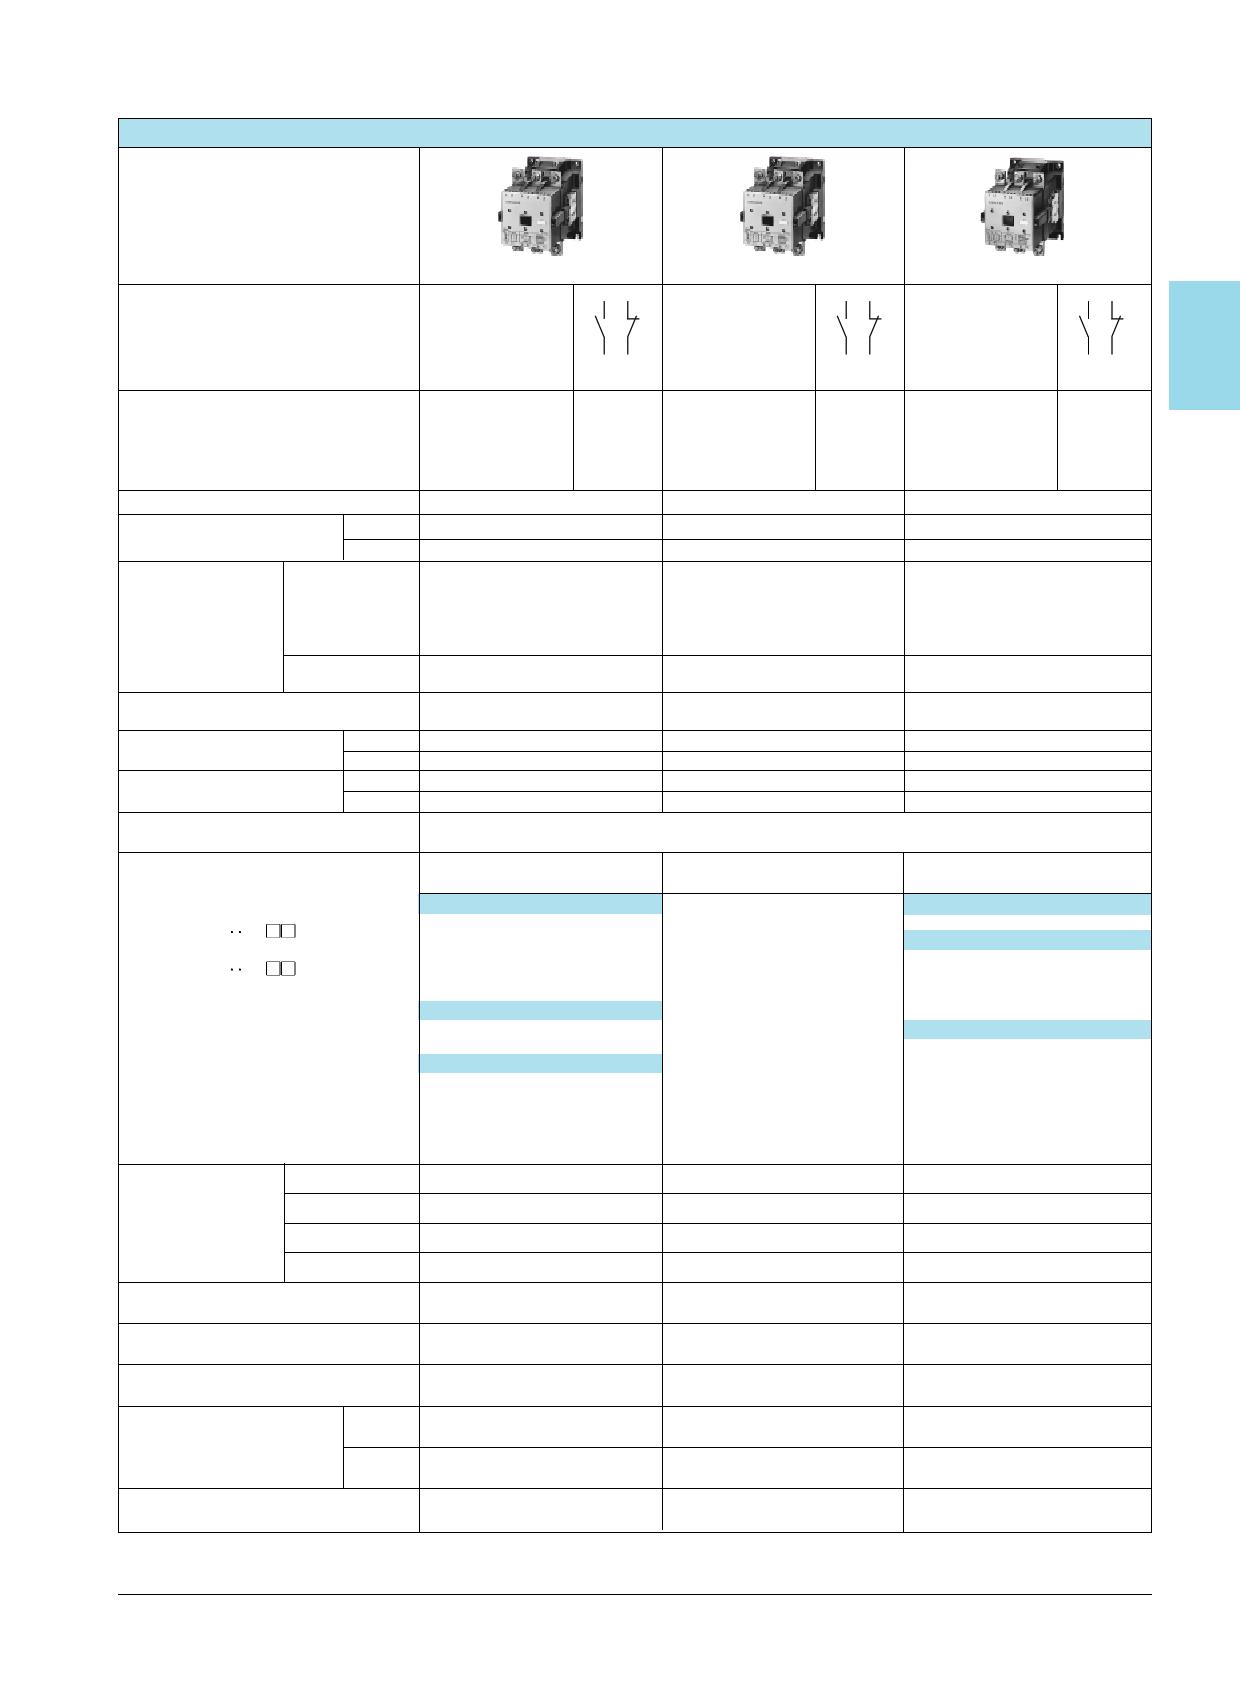 3TF47 Datasheet, Funktion